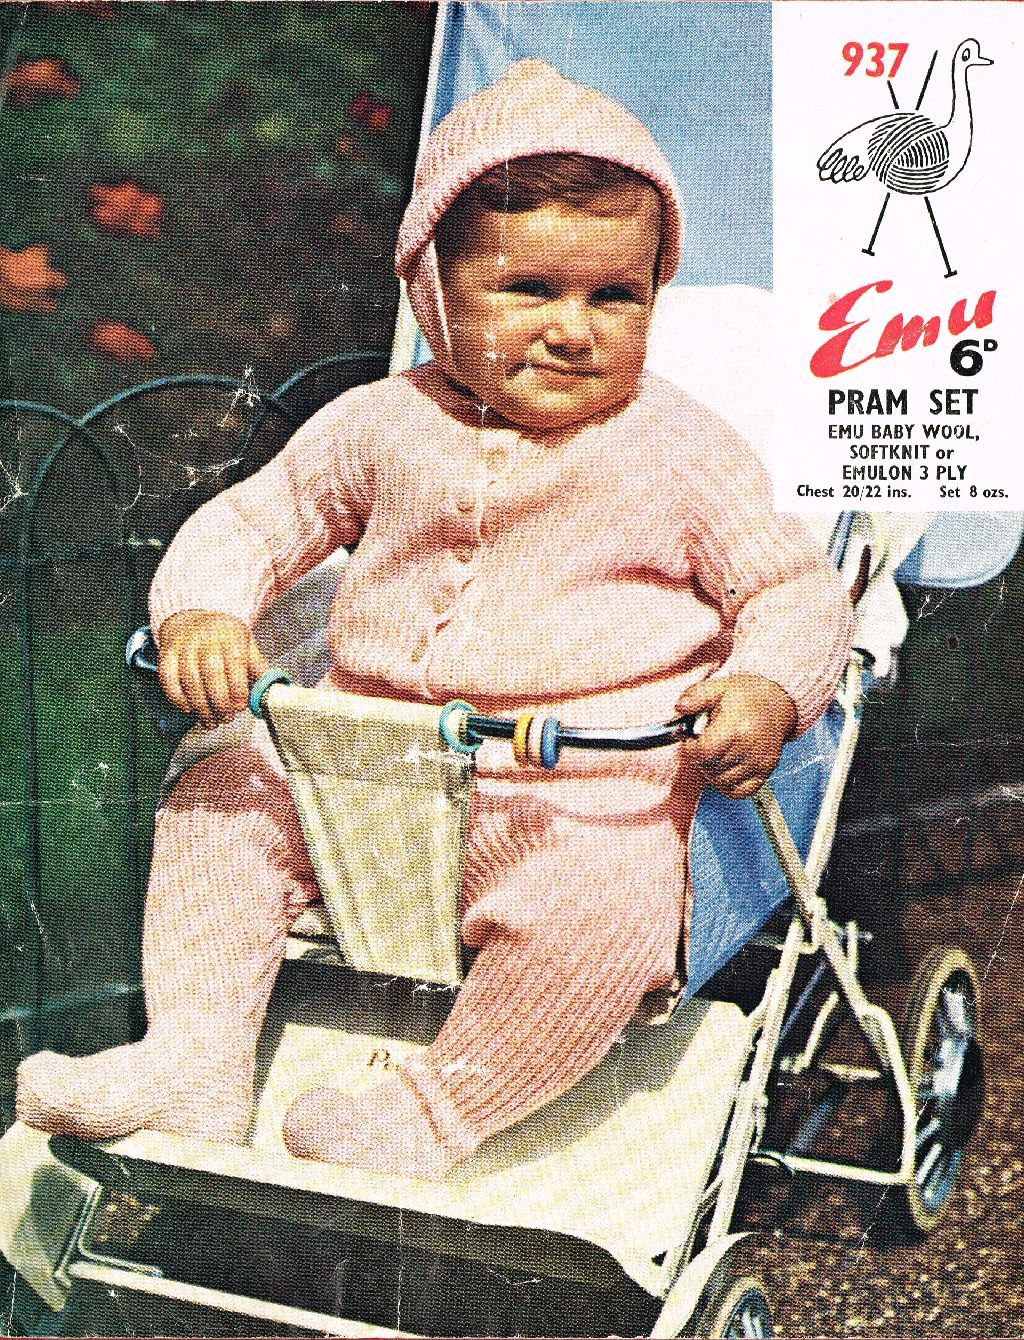 Emu 937 vintage baby knitting pattern  https://www.facebook.com/groups/463649903783886